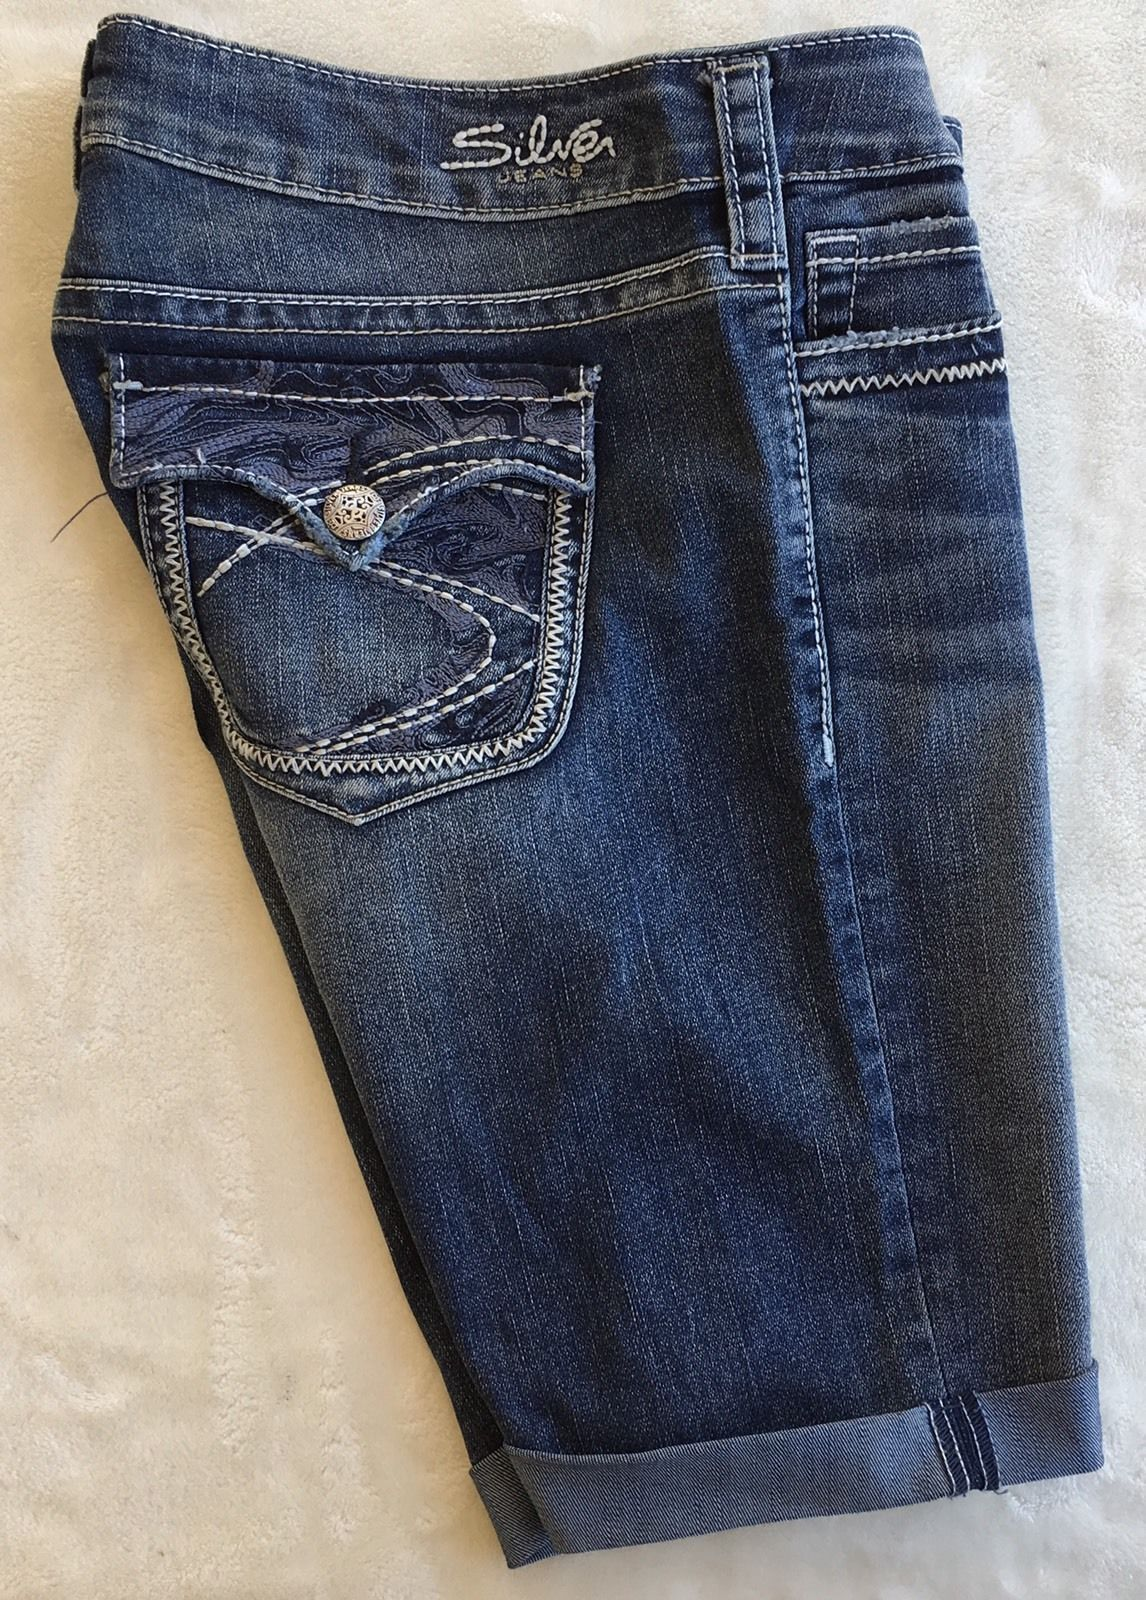 SILVER Jeans Sale Low Rise Pioneer Flap Pocket Denim Stretch Jean Mid Shorts 27